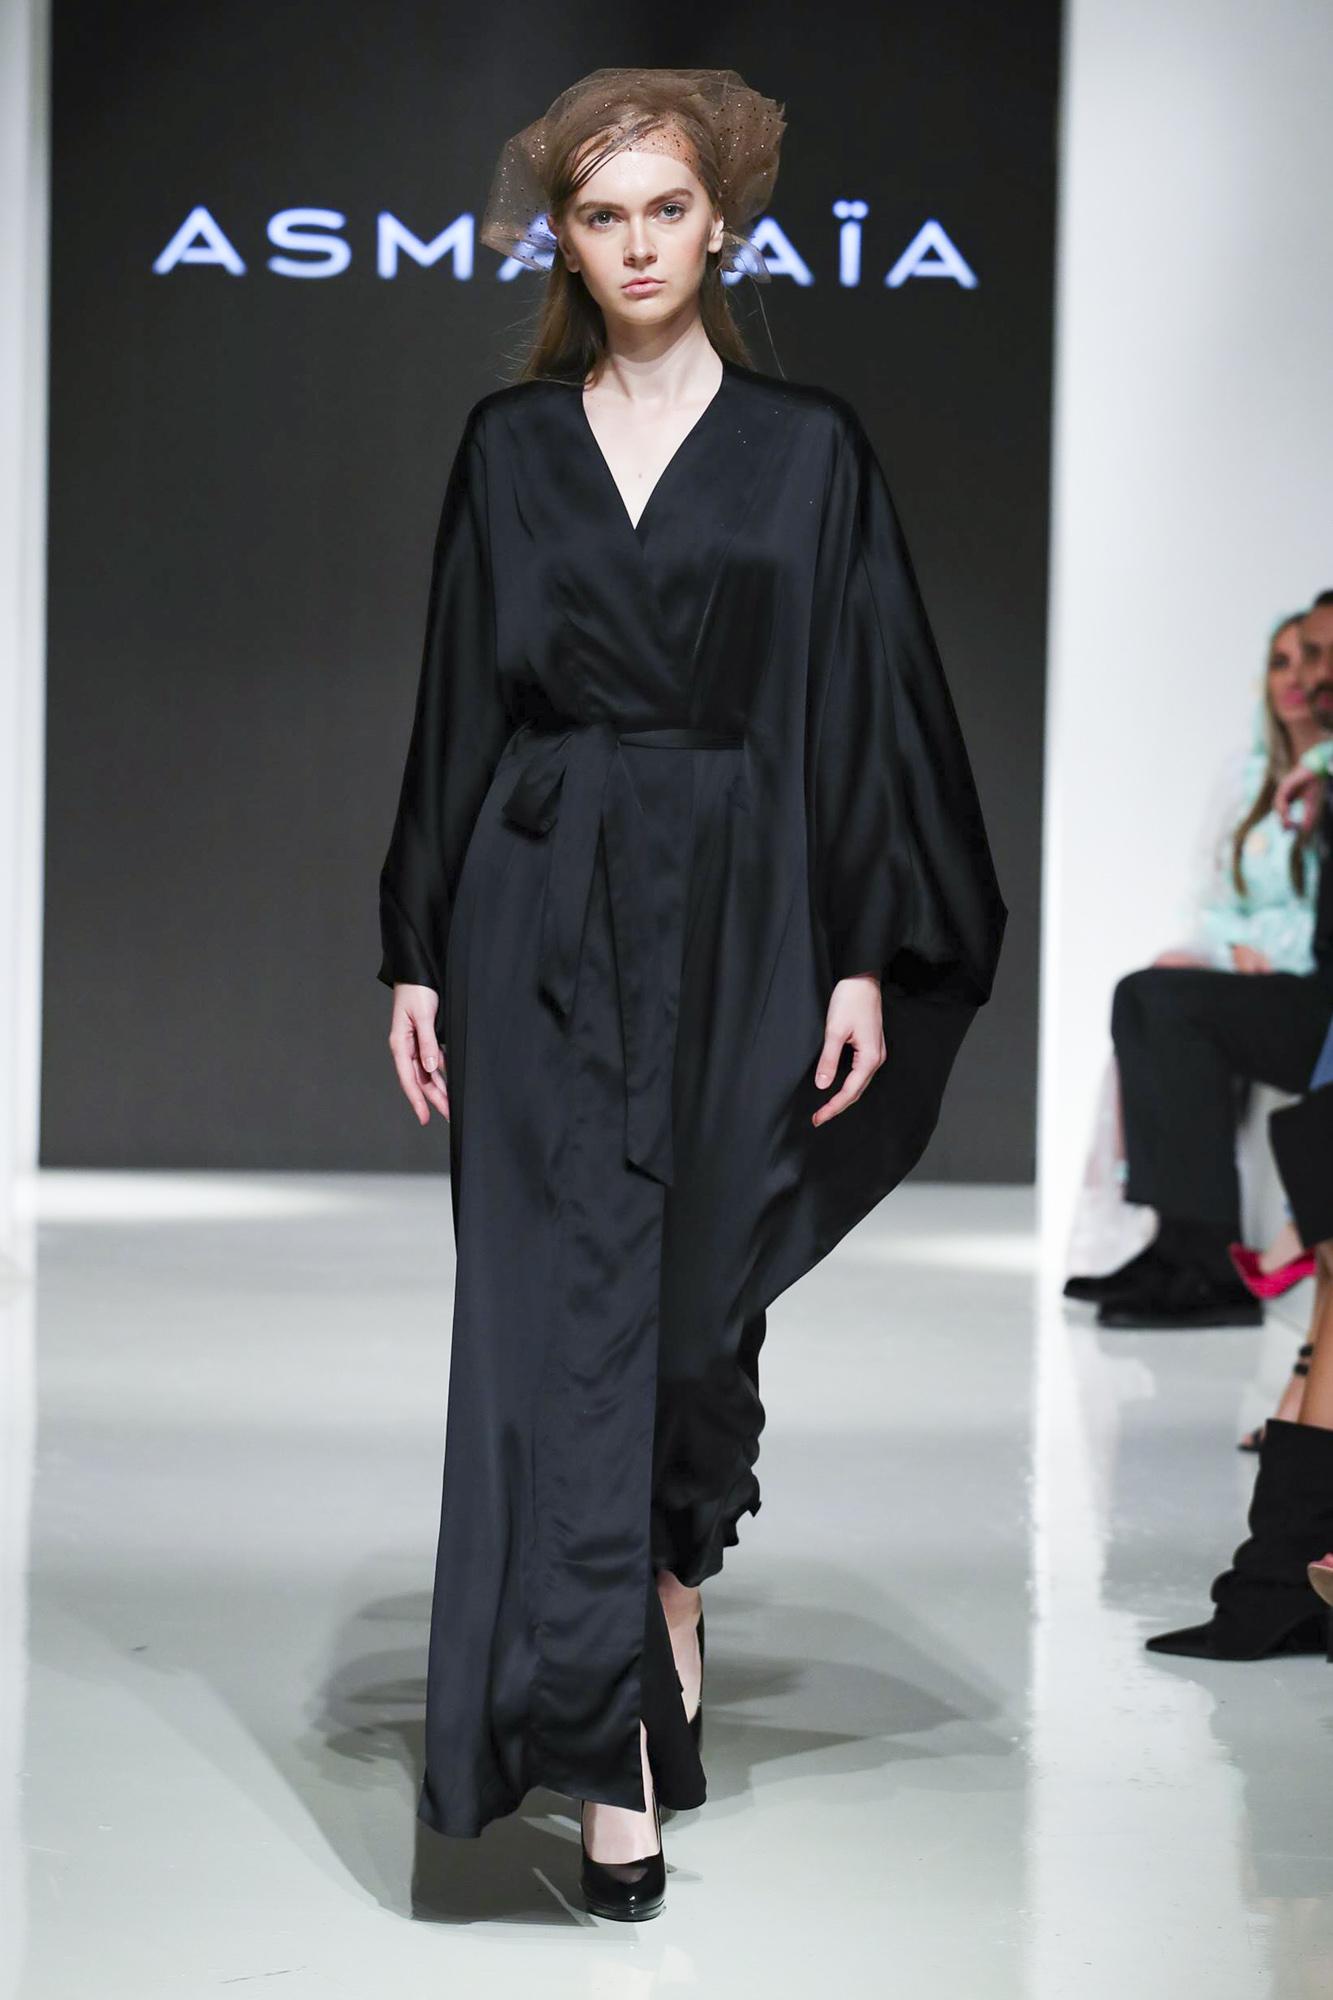 Asmaraia fashion show, Arab Fashion Week collection Spring Summer 2020 in Dubai